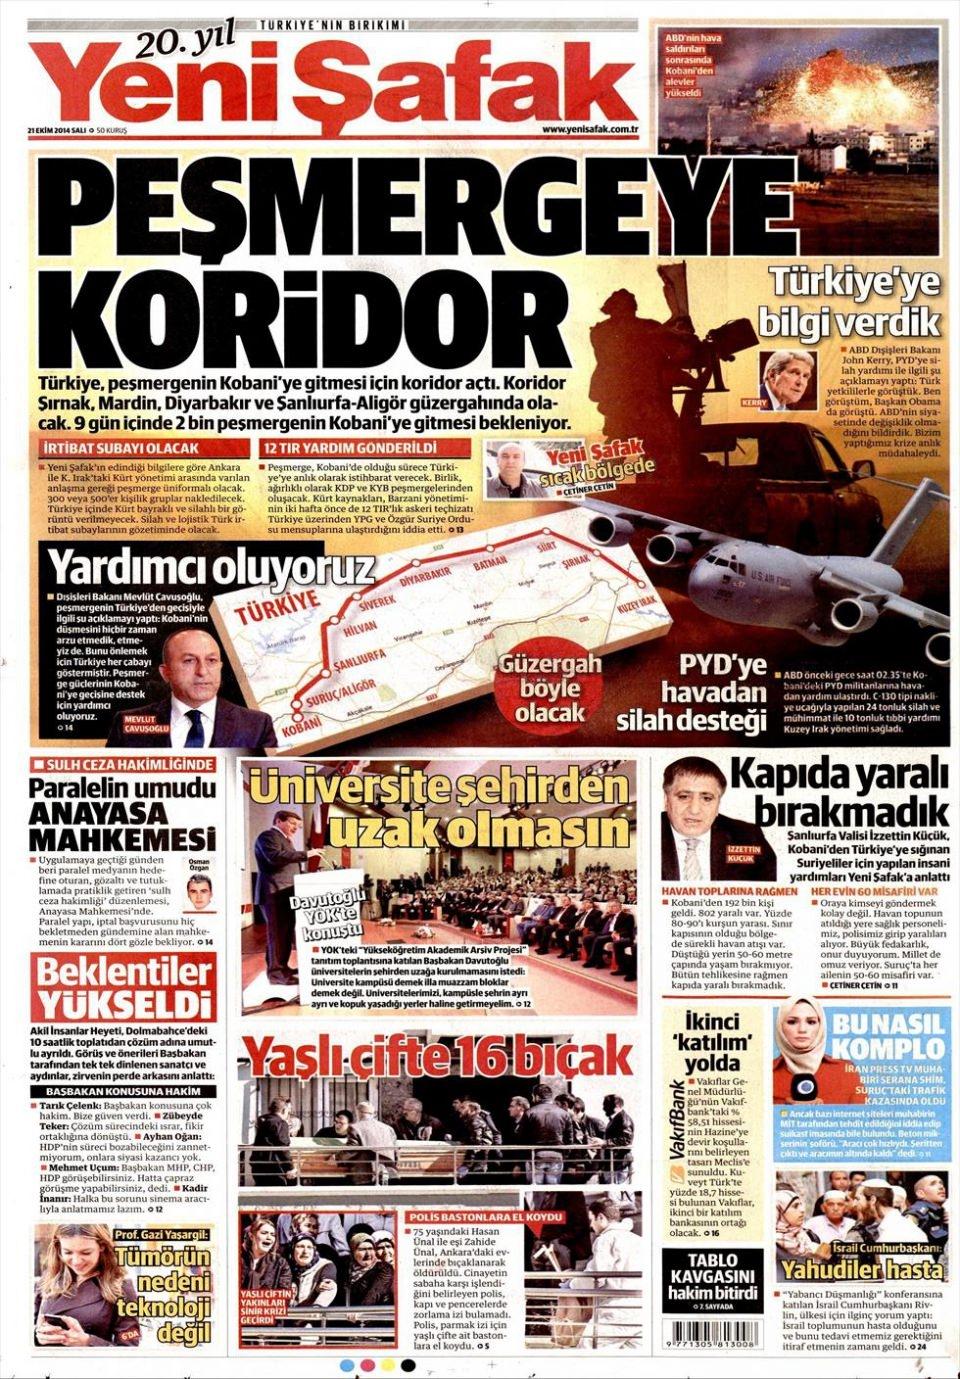 21 Ekim 2014 gazete manşetleri 23